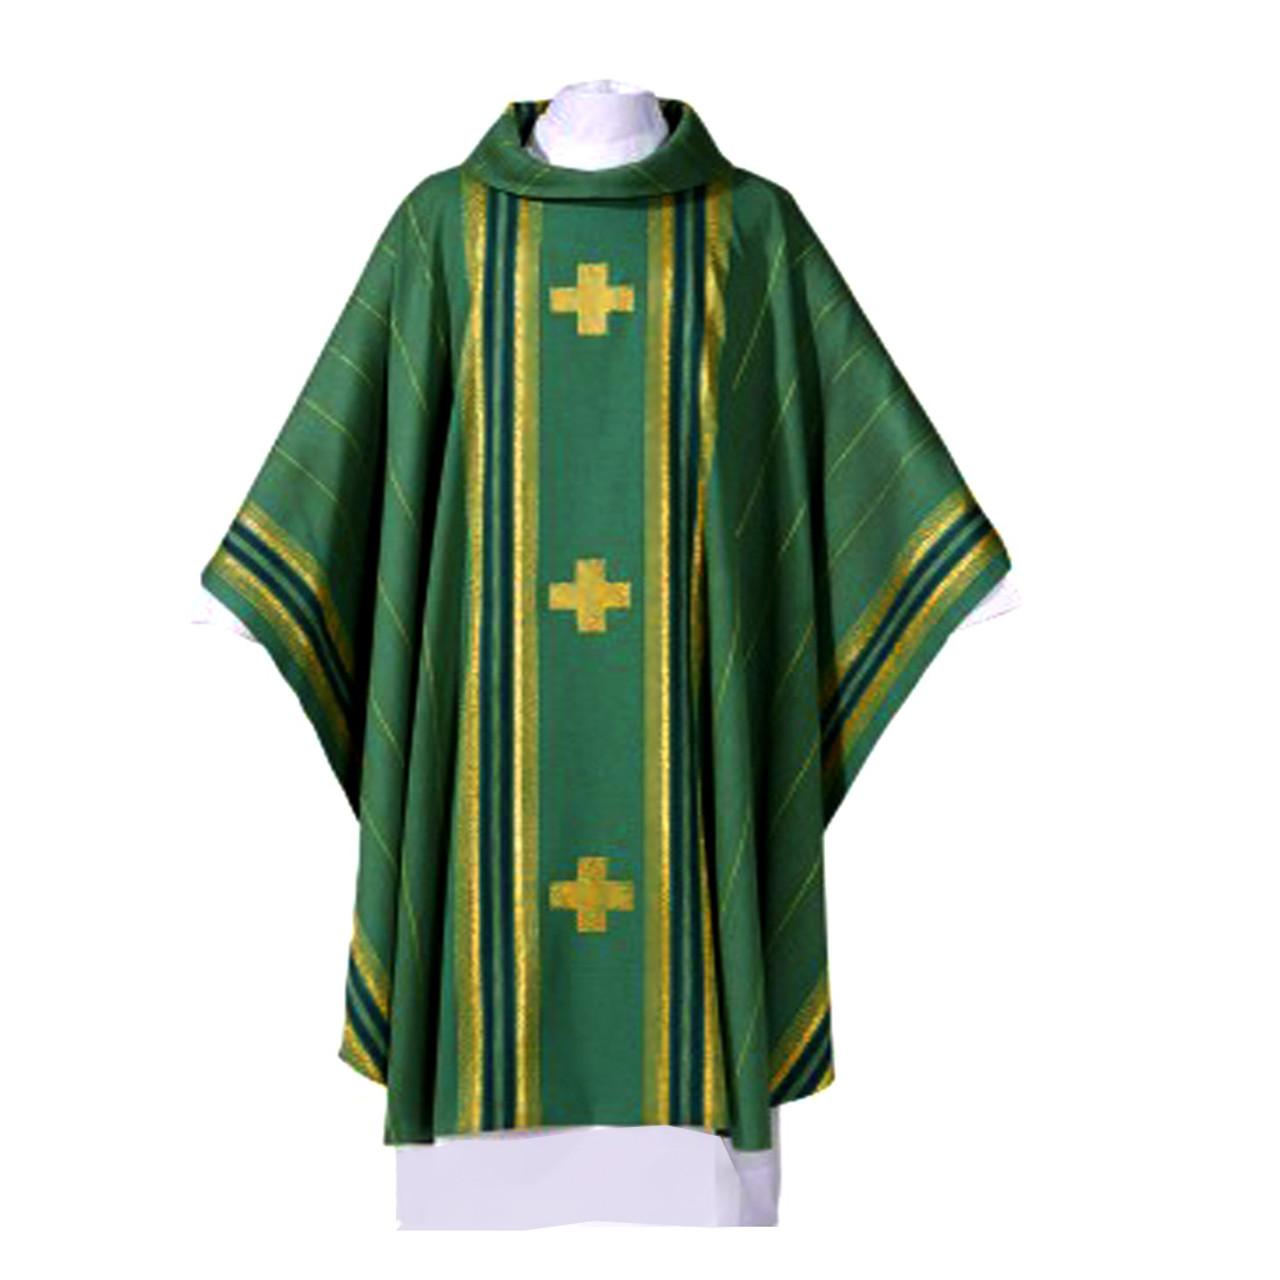 Green Chasuble Macarius Fabric